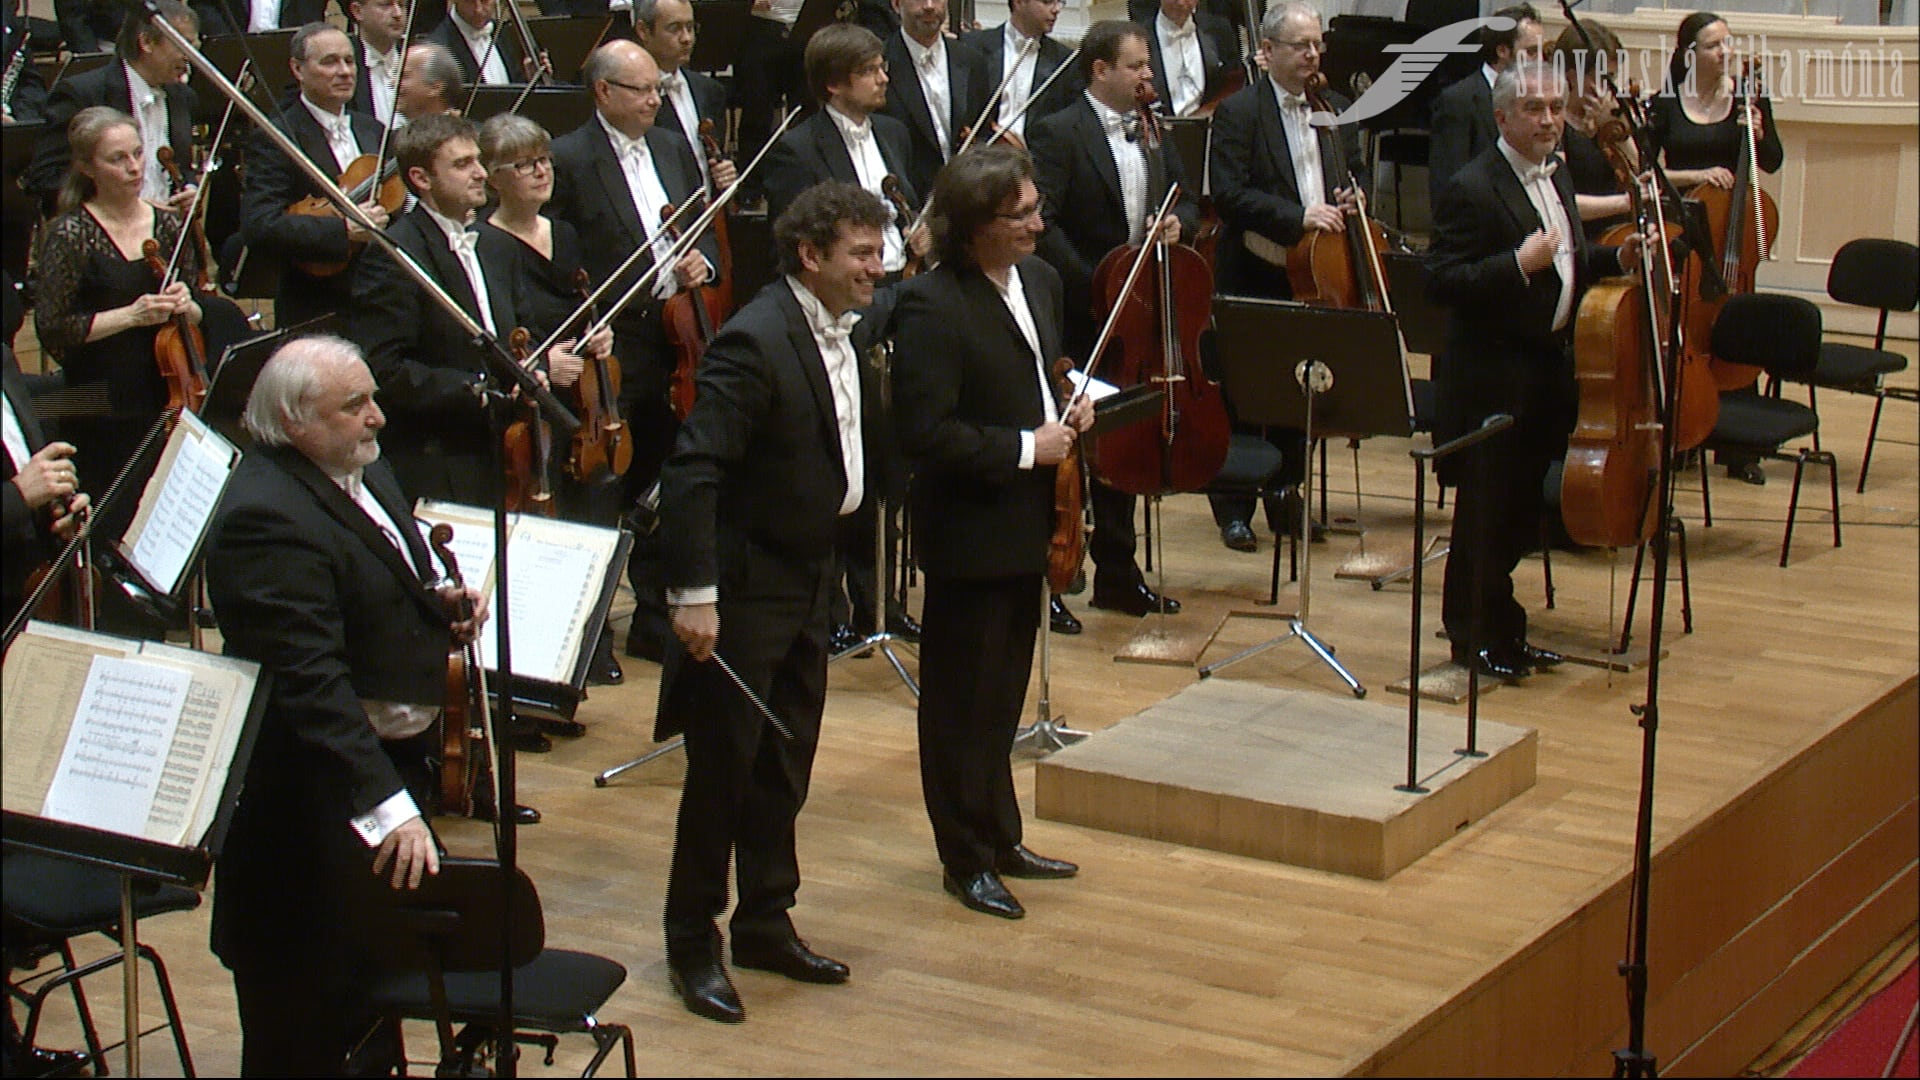 Schumann, Karłowicz, Mendelssohn Bartholdy